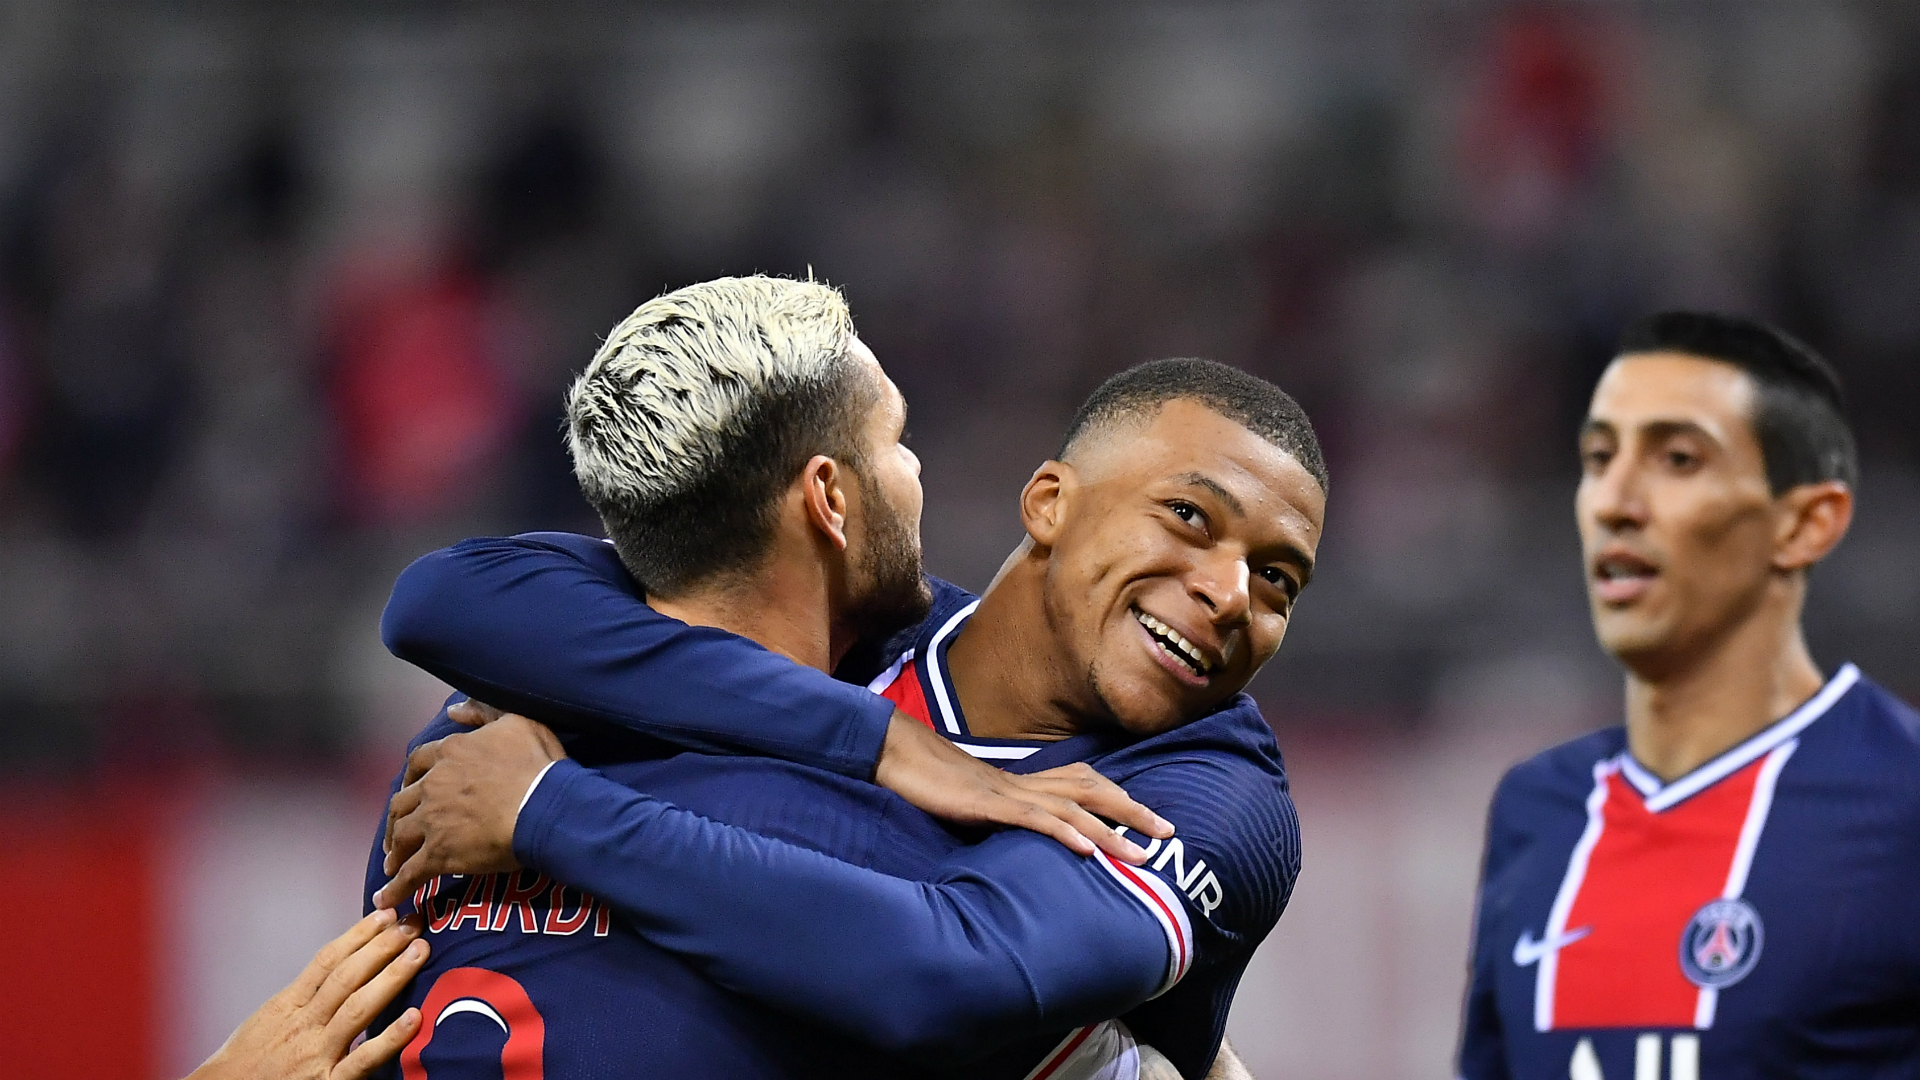 Stade de Reims vs. Paris Saint-Germain - Football Match Report